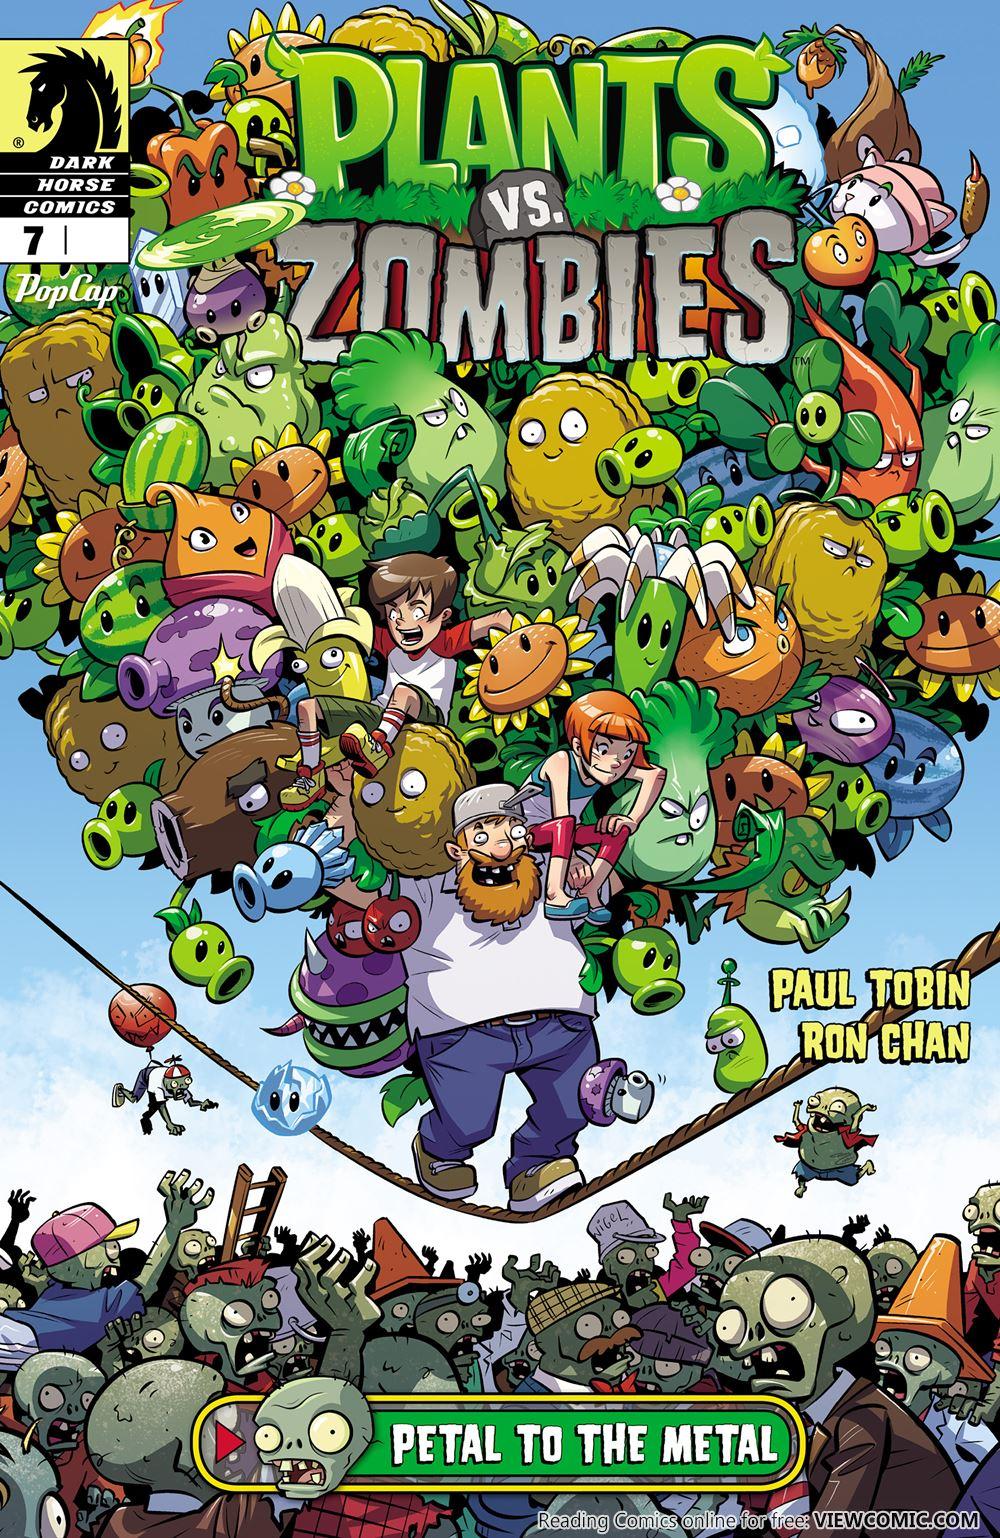 Plants vs. Zombies: Petal to the Metal | Plants vs. Zombies Wiki | FANDOM powered by Wikia